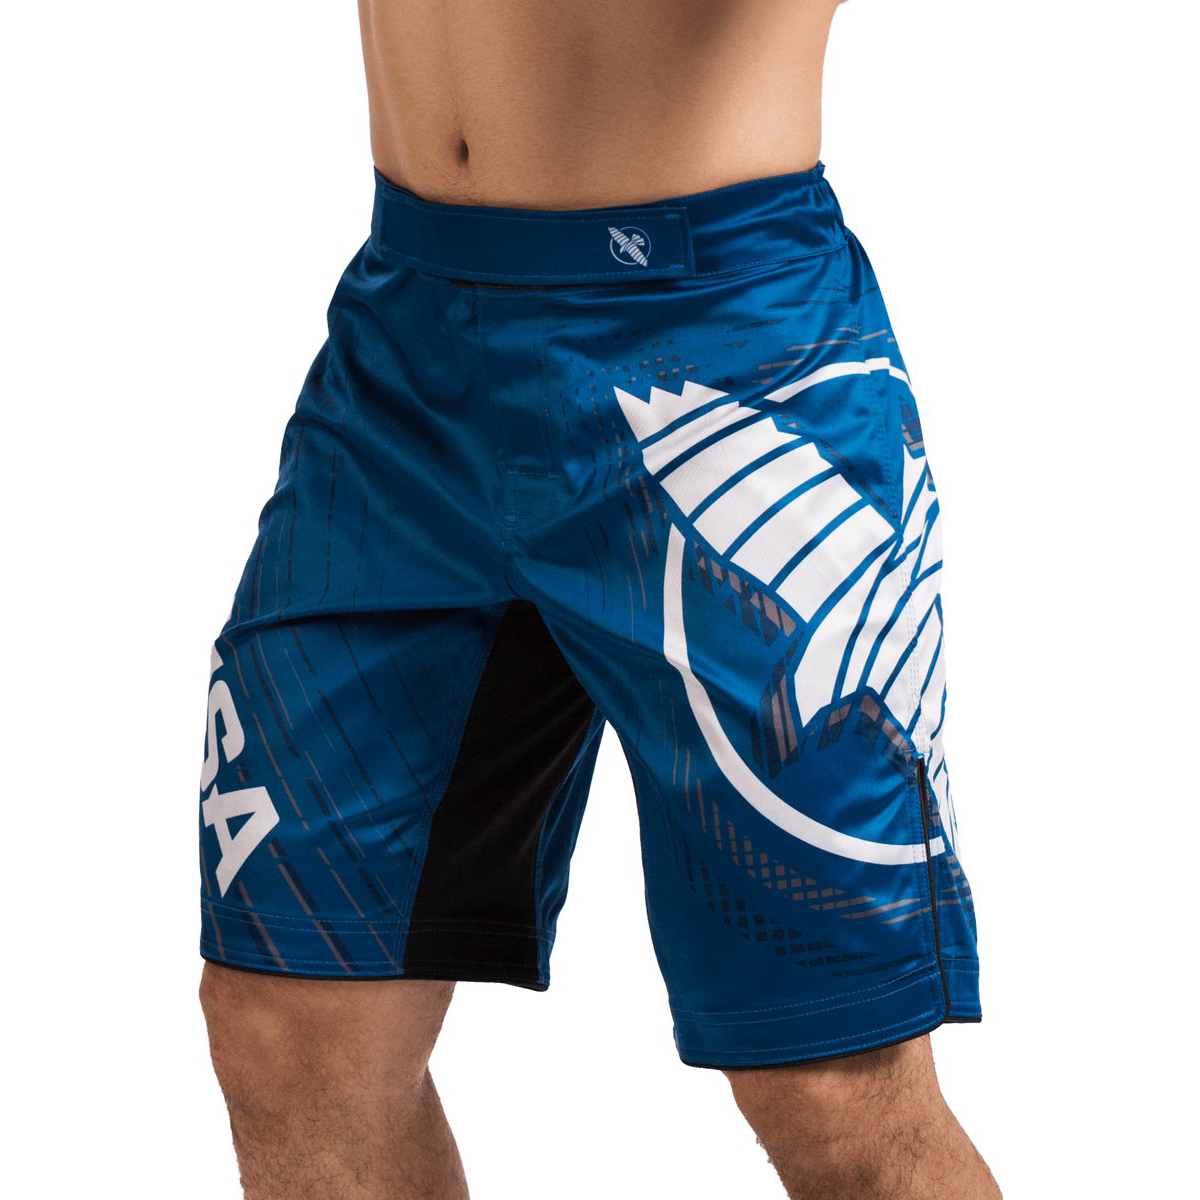 SALE Hayabusa Compression Underwear Boxer Shorts MMA BJJ Jiu Jitsu Blue XL